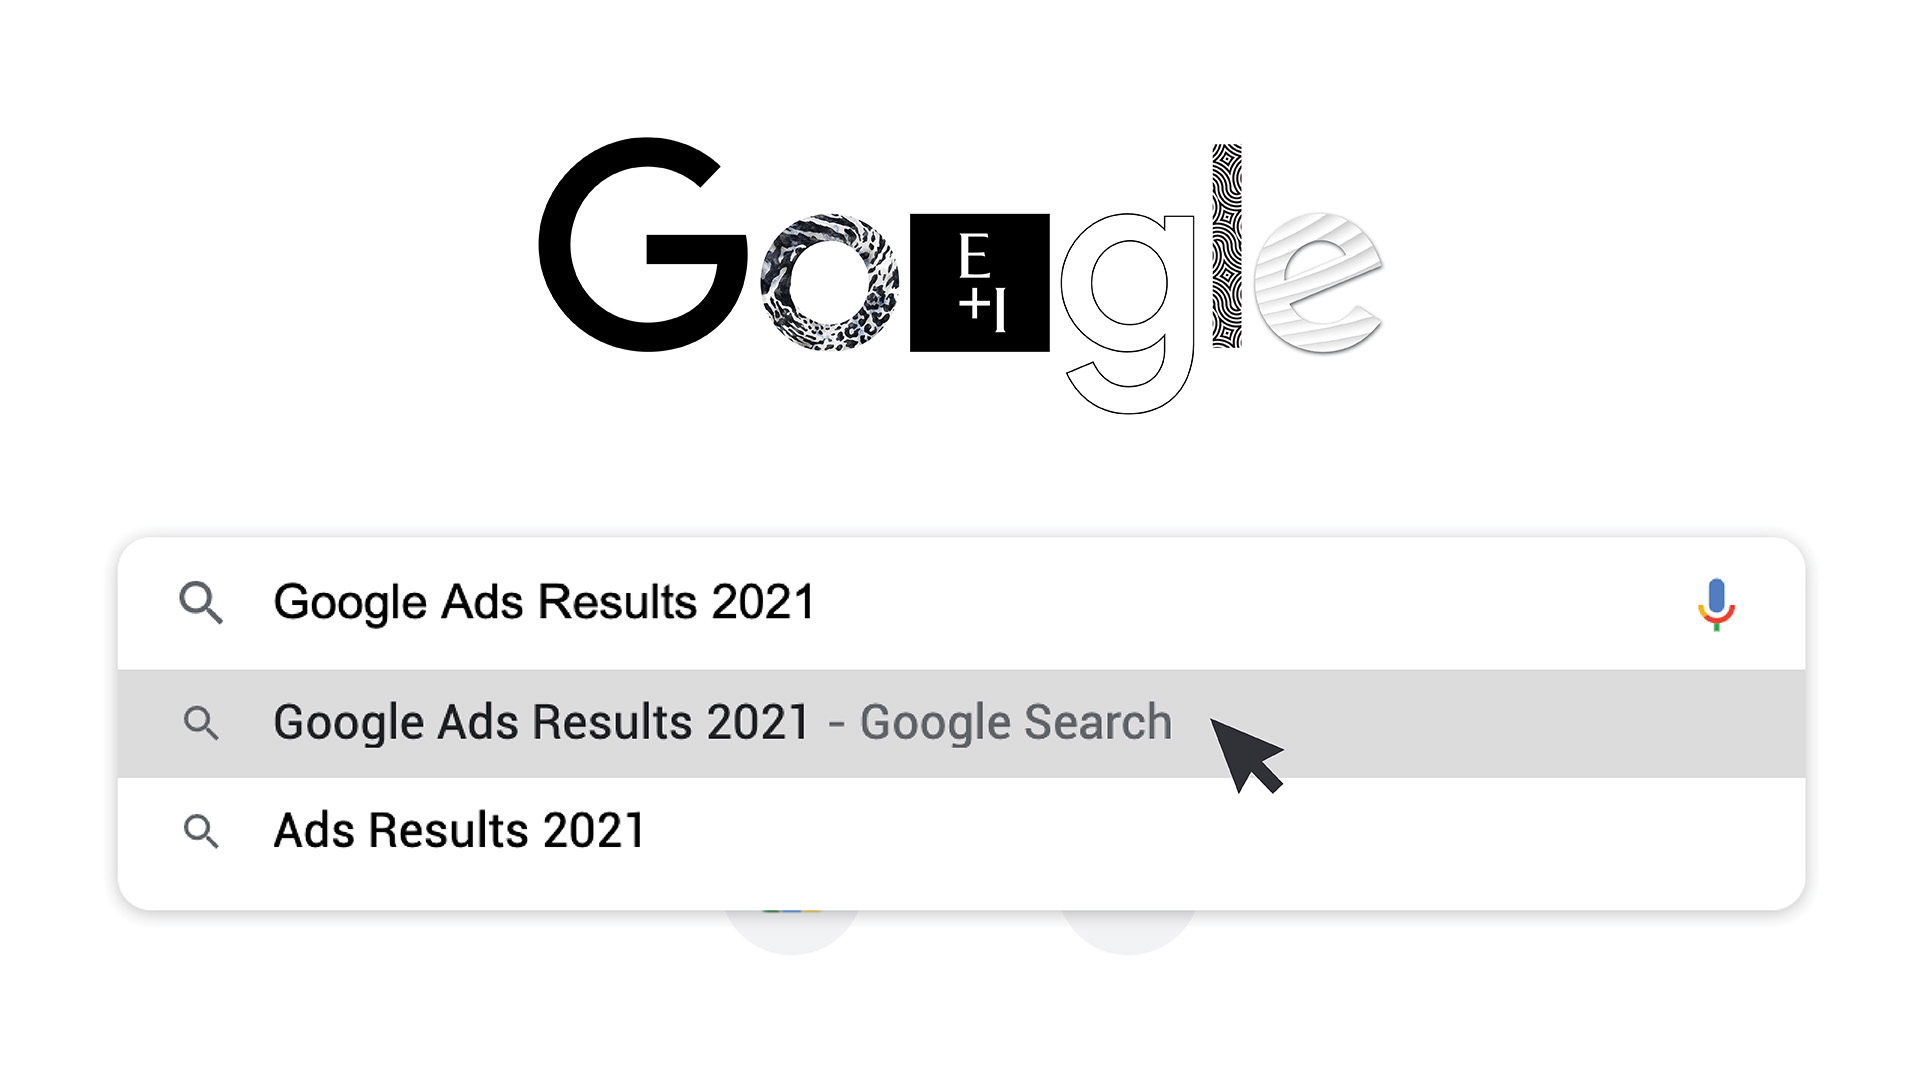 Keywords: Google Ads | Covid-19 | Increase online sales